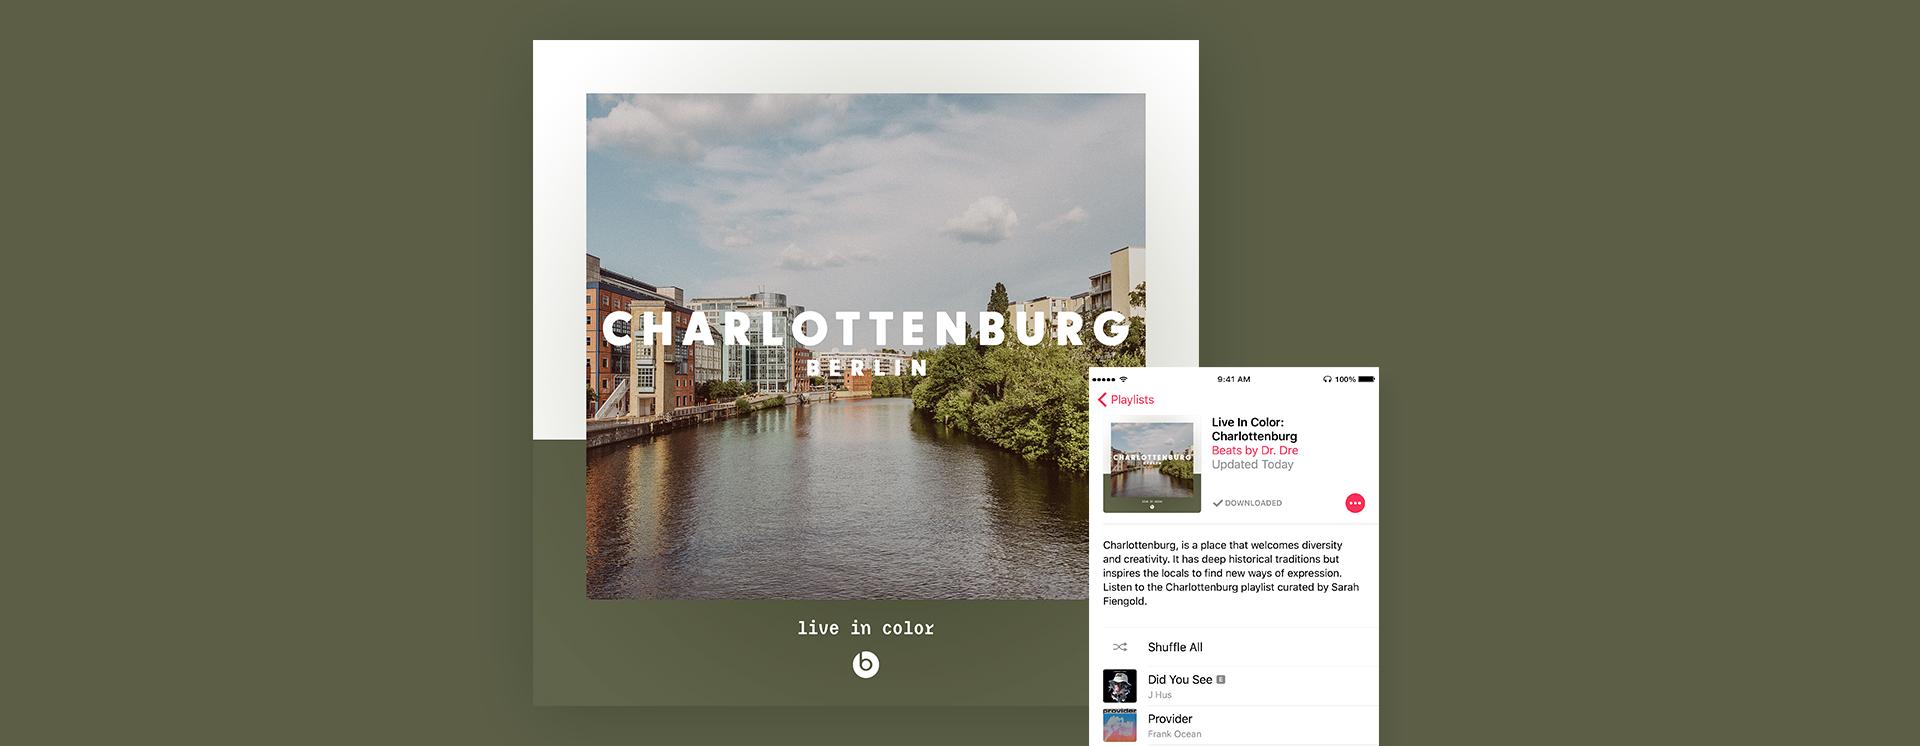 Playlist_Charlottenburg.png